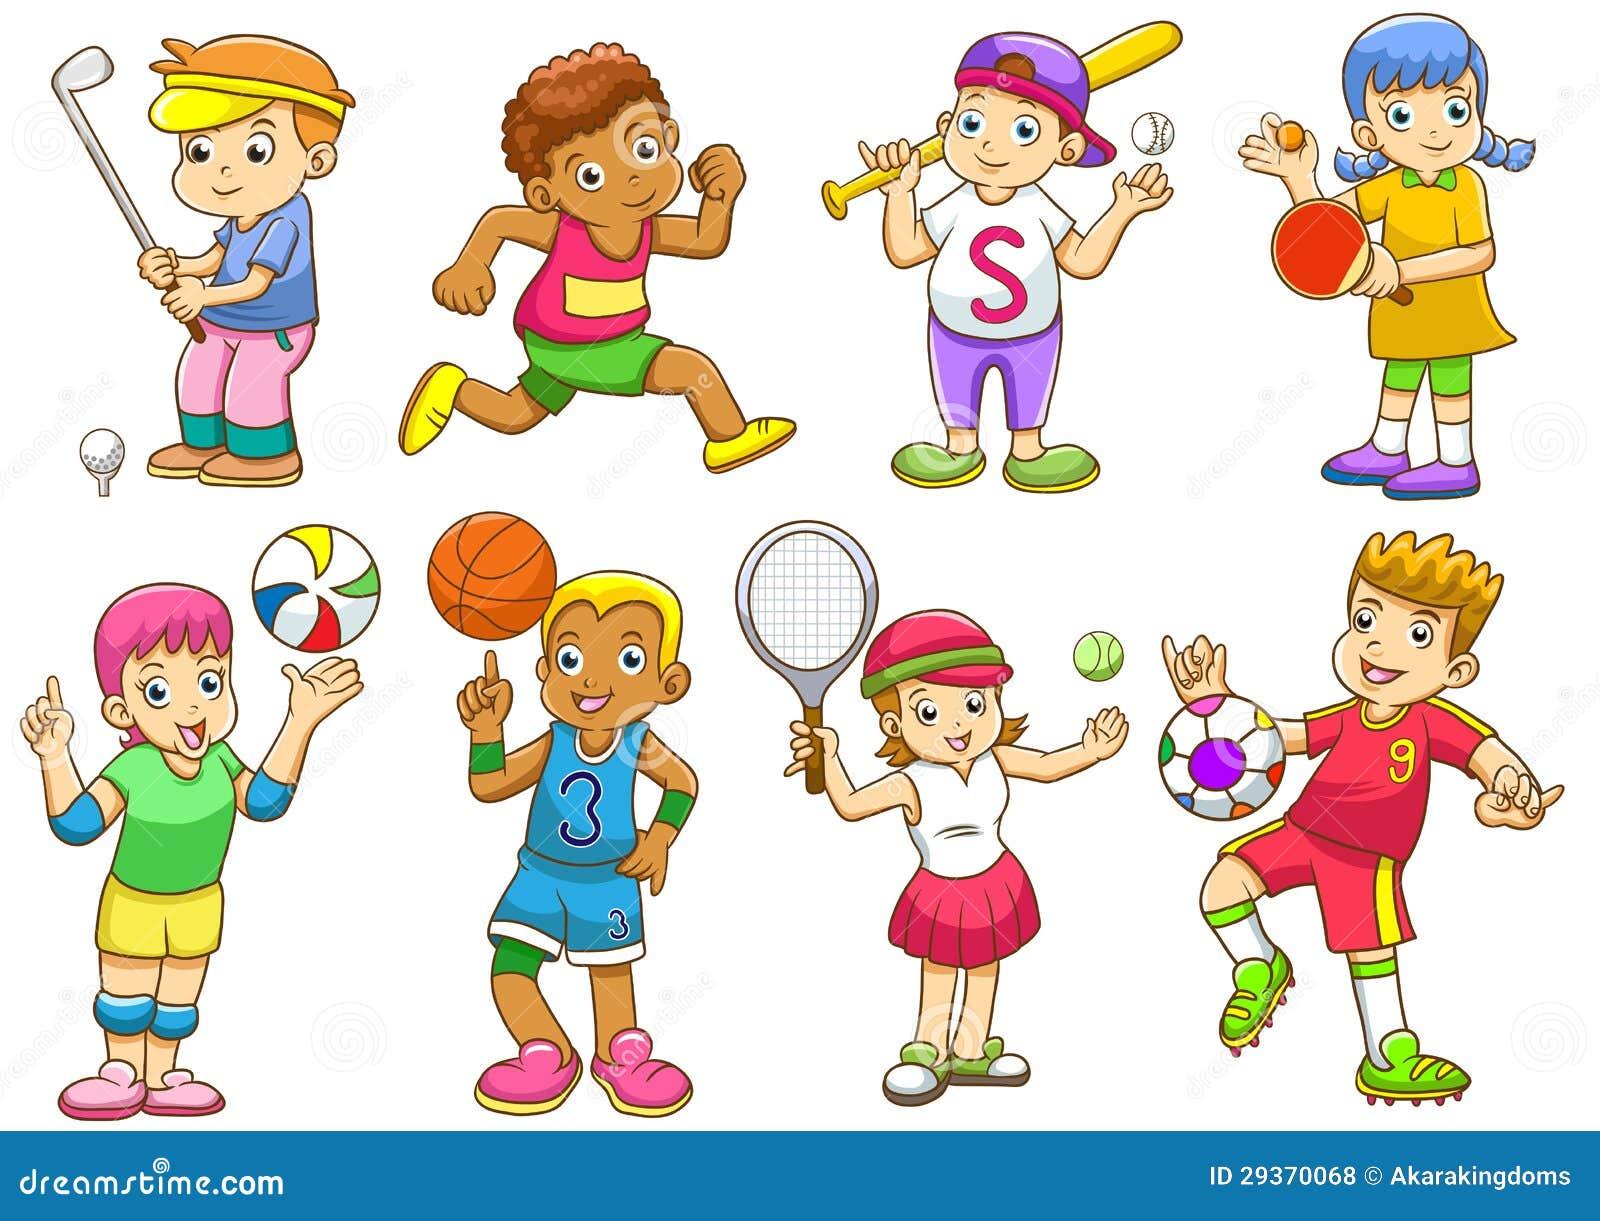 illustratie van kinderen die verschillende sporten spelen vector illustratie illustratie. Black Bedroom Furniture Sets. Home Design Ideas